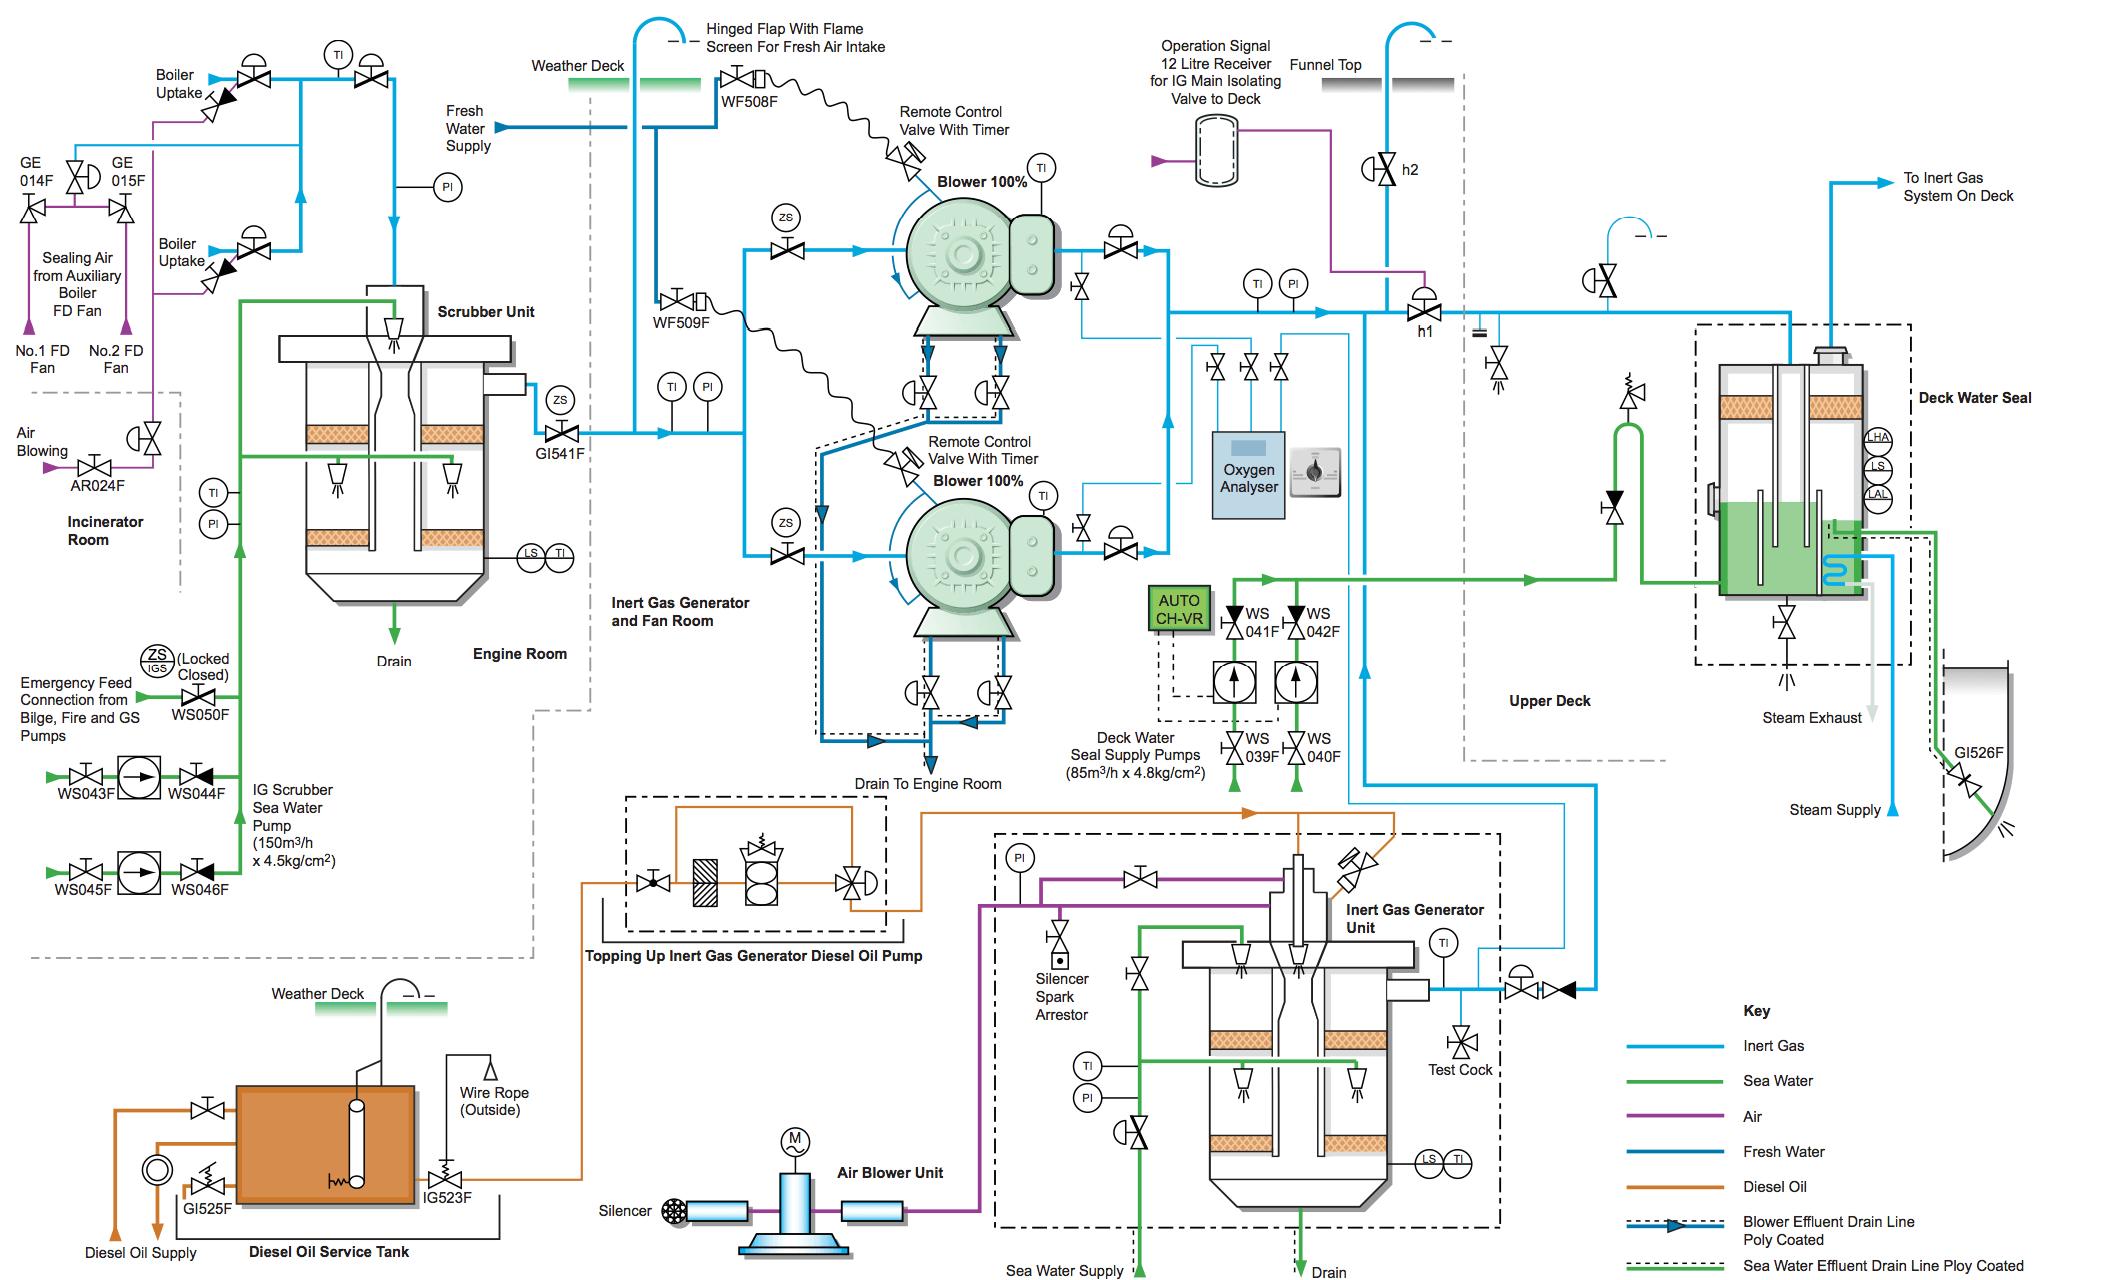 seaflo live bait air pump user manual pdf